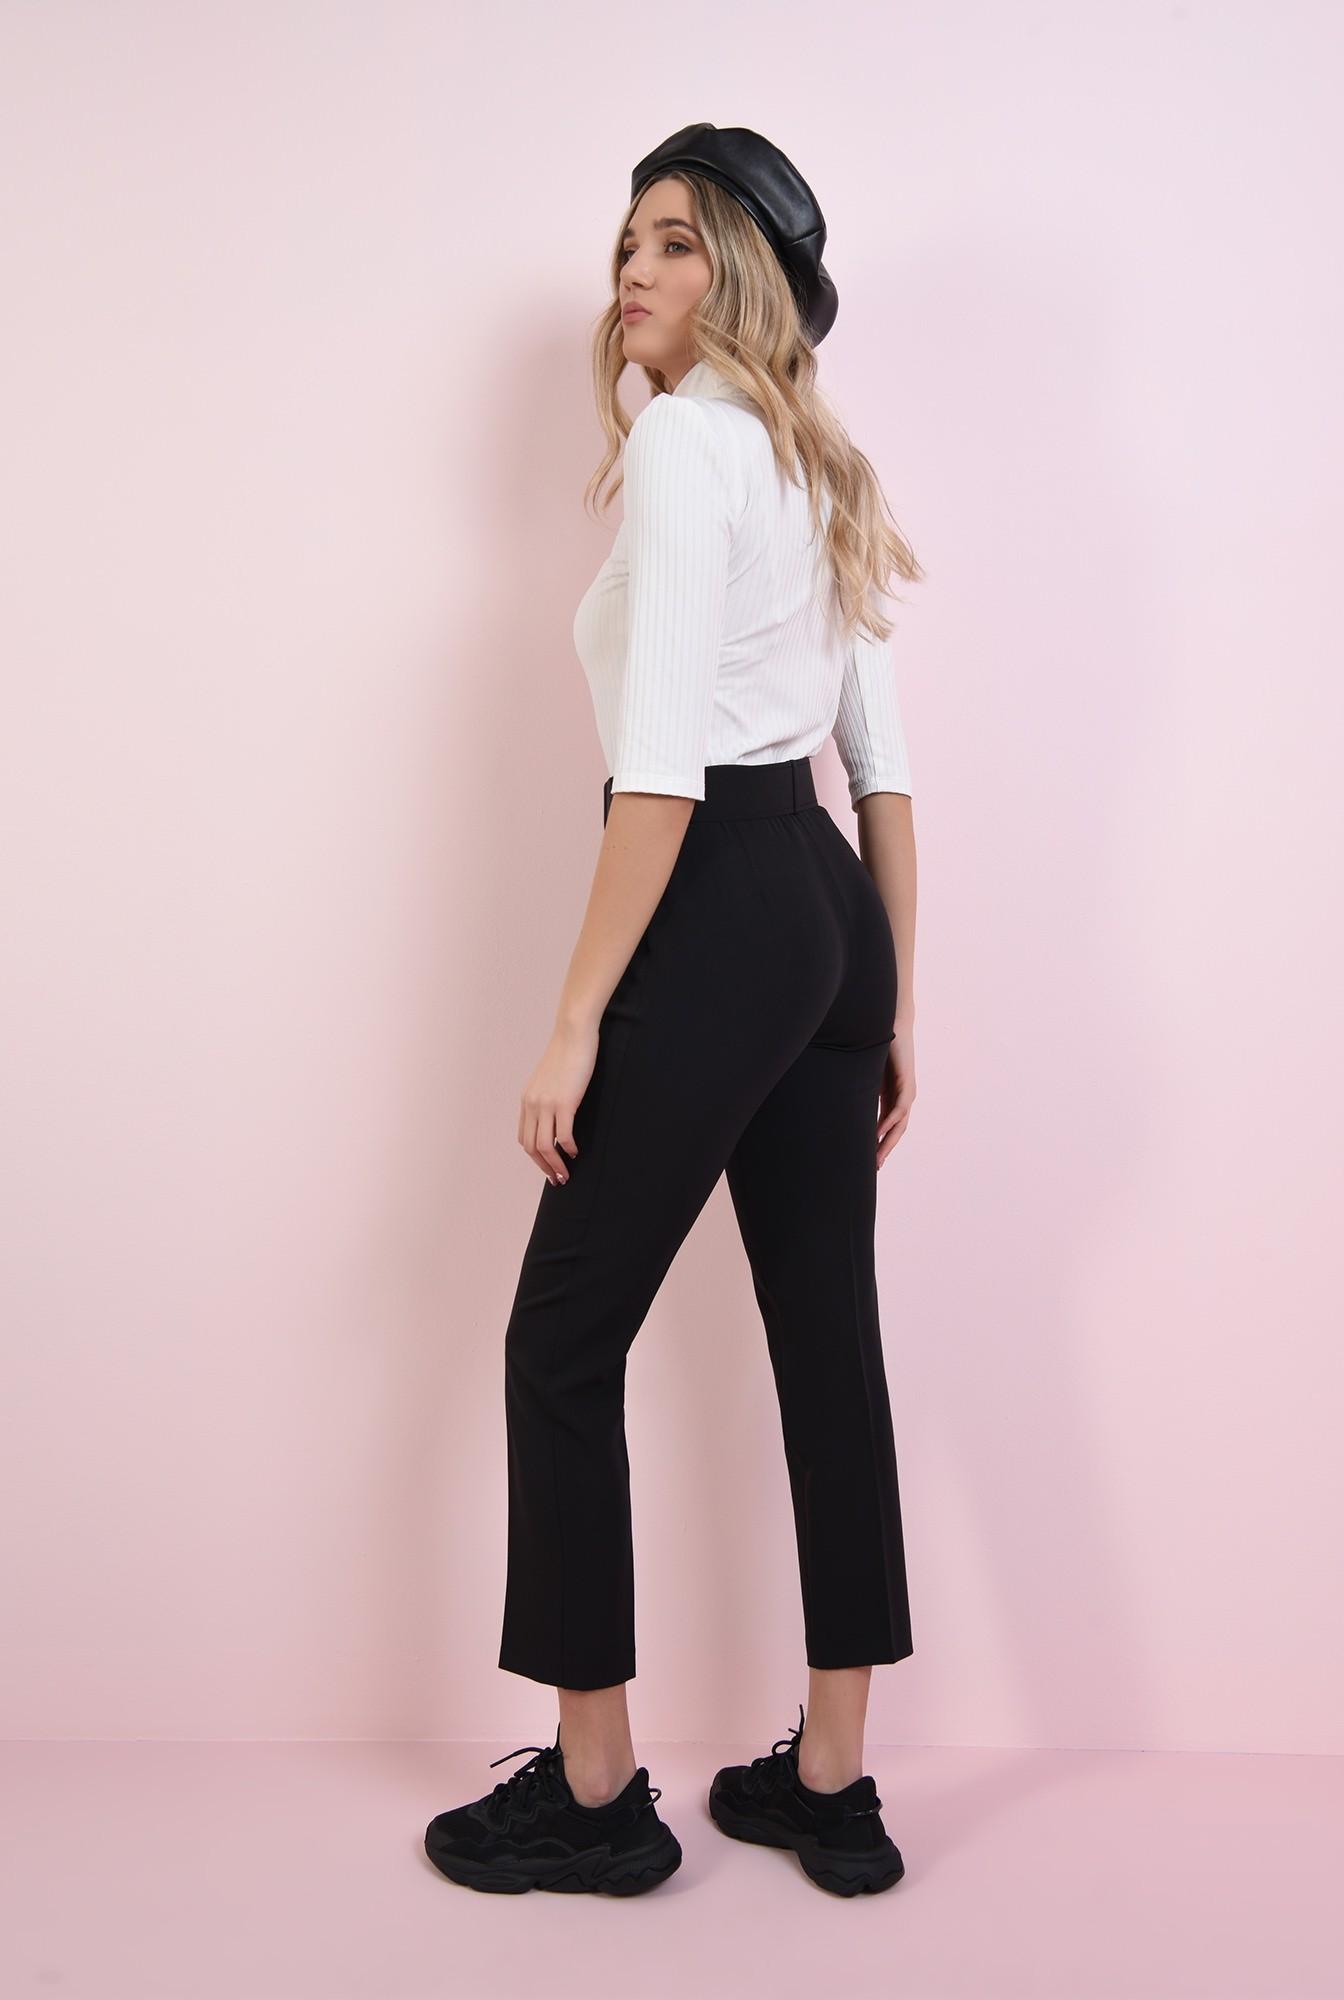 1 - pantaloninegri, cu talie medie, cu centura